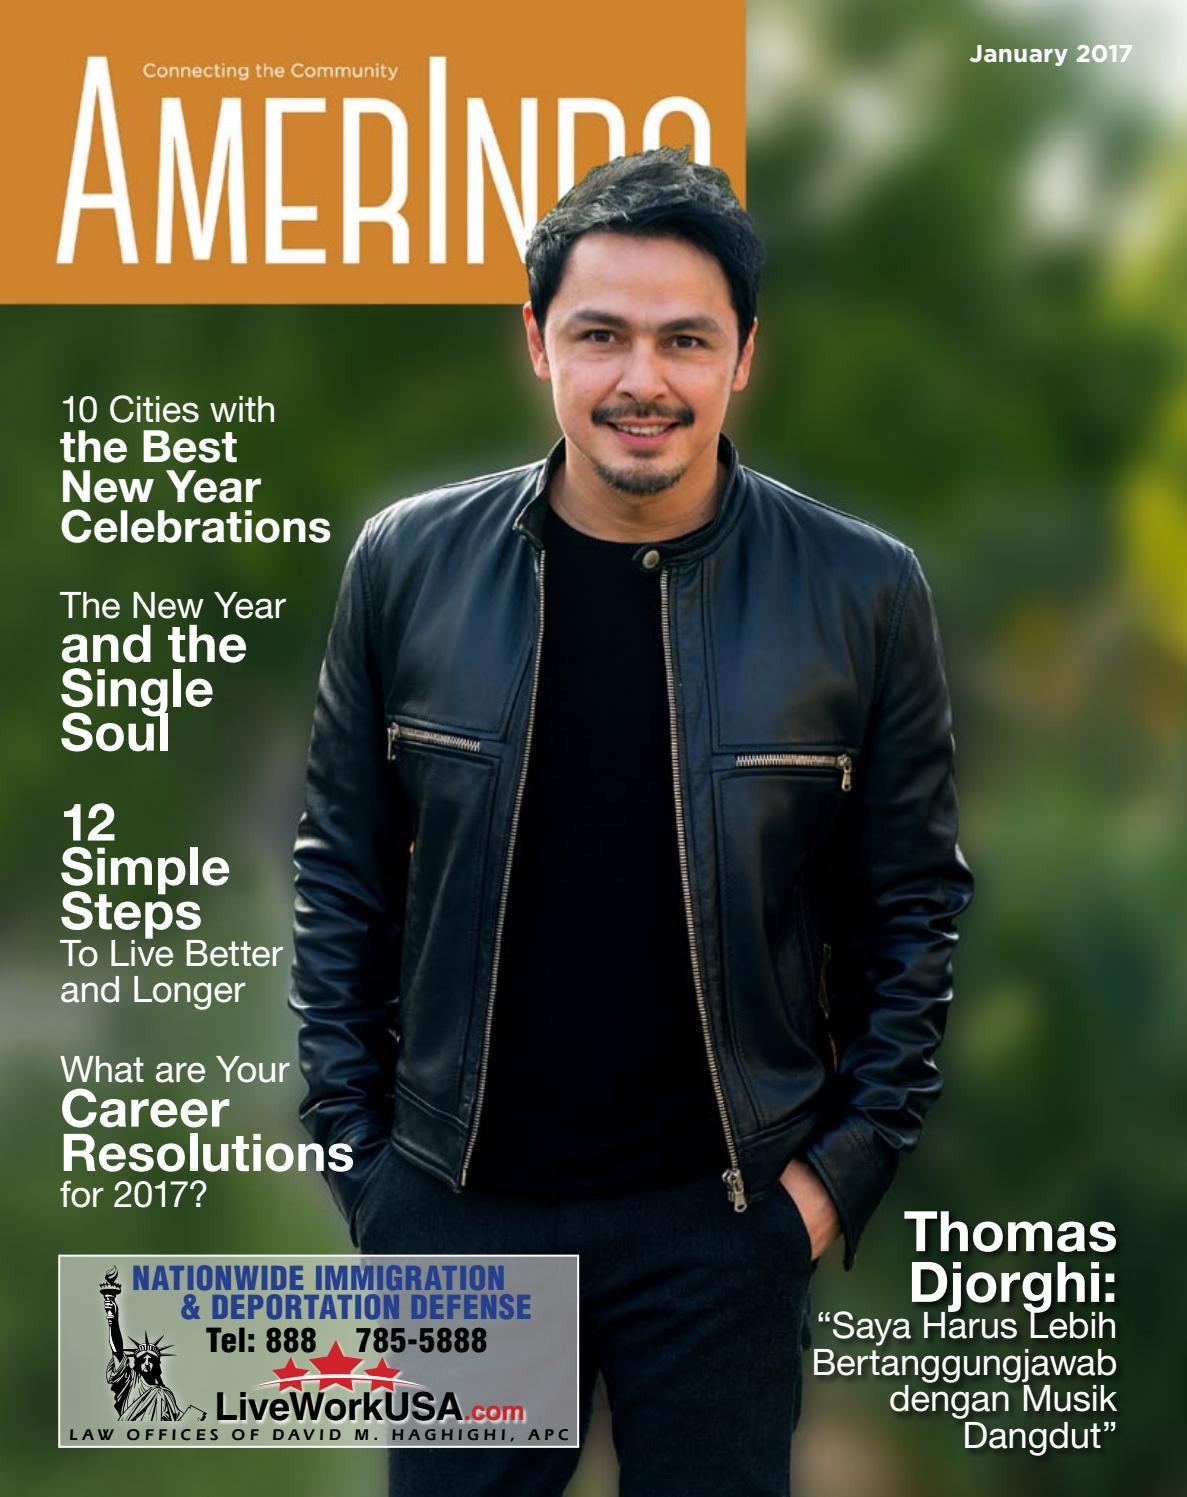 January 2017 Issue 18 By Amerindo Issuu